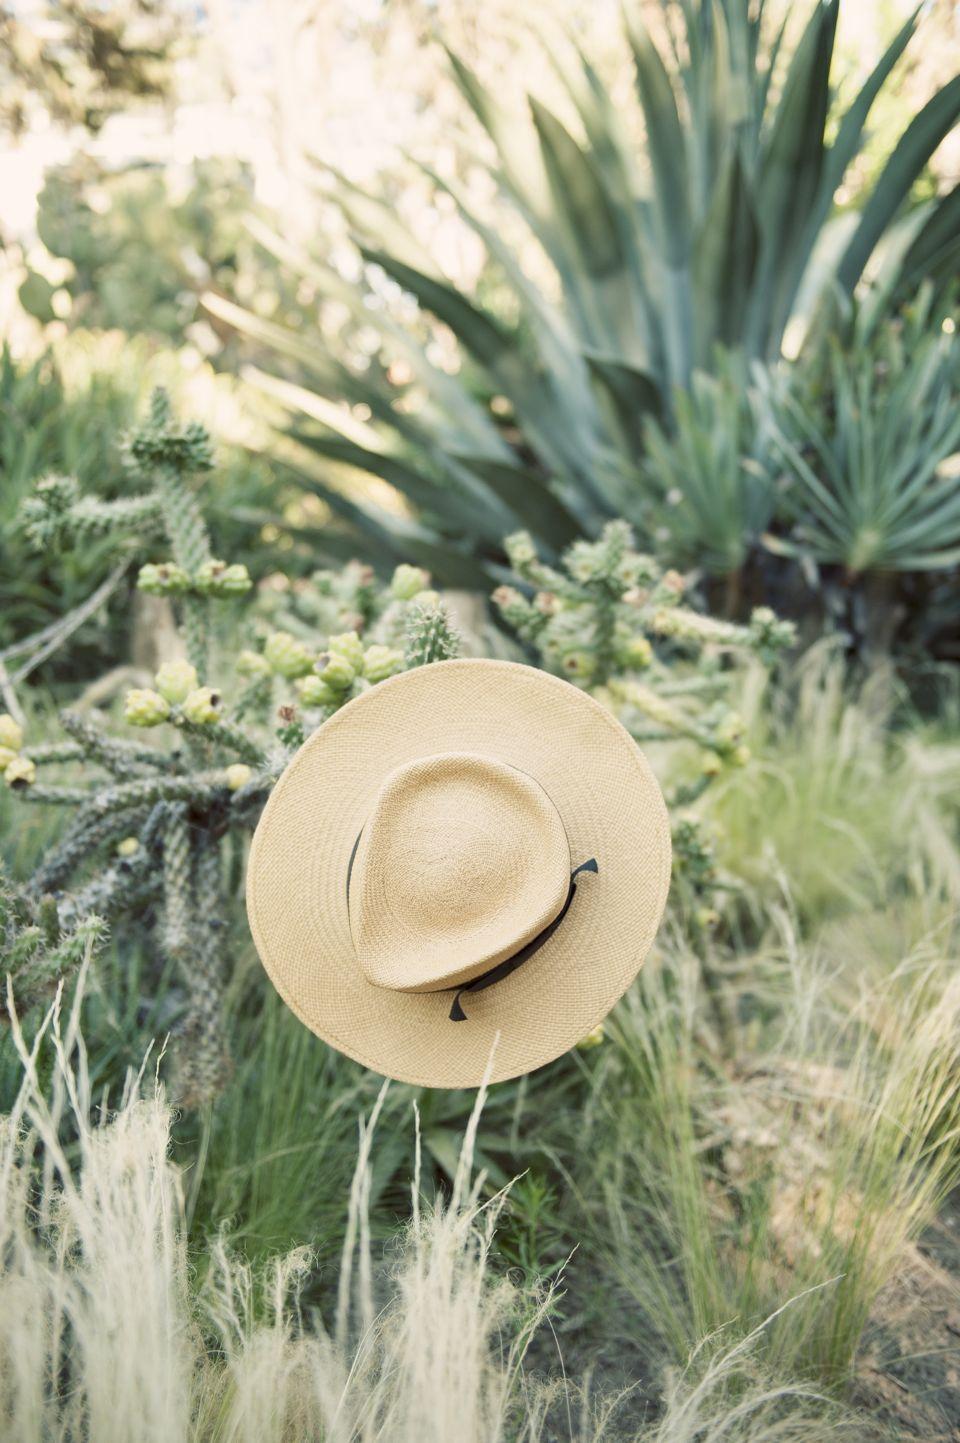 straw hat dessert daydreaming